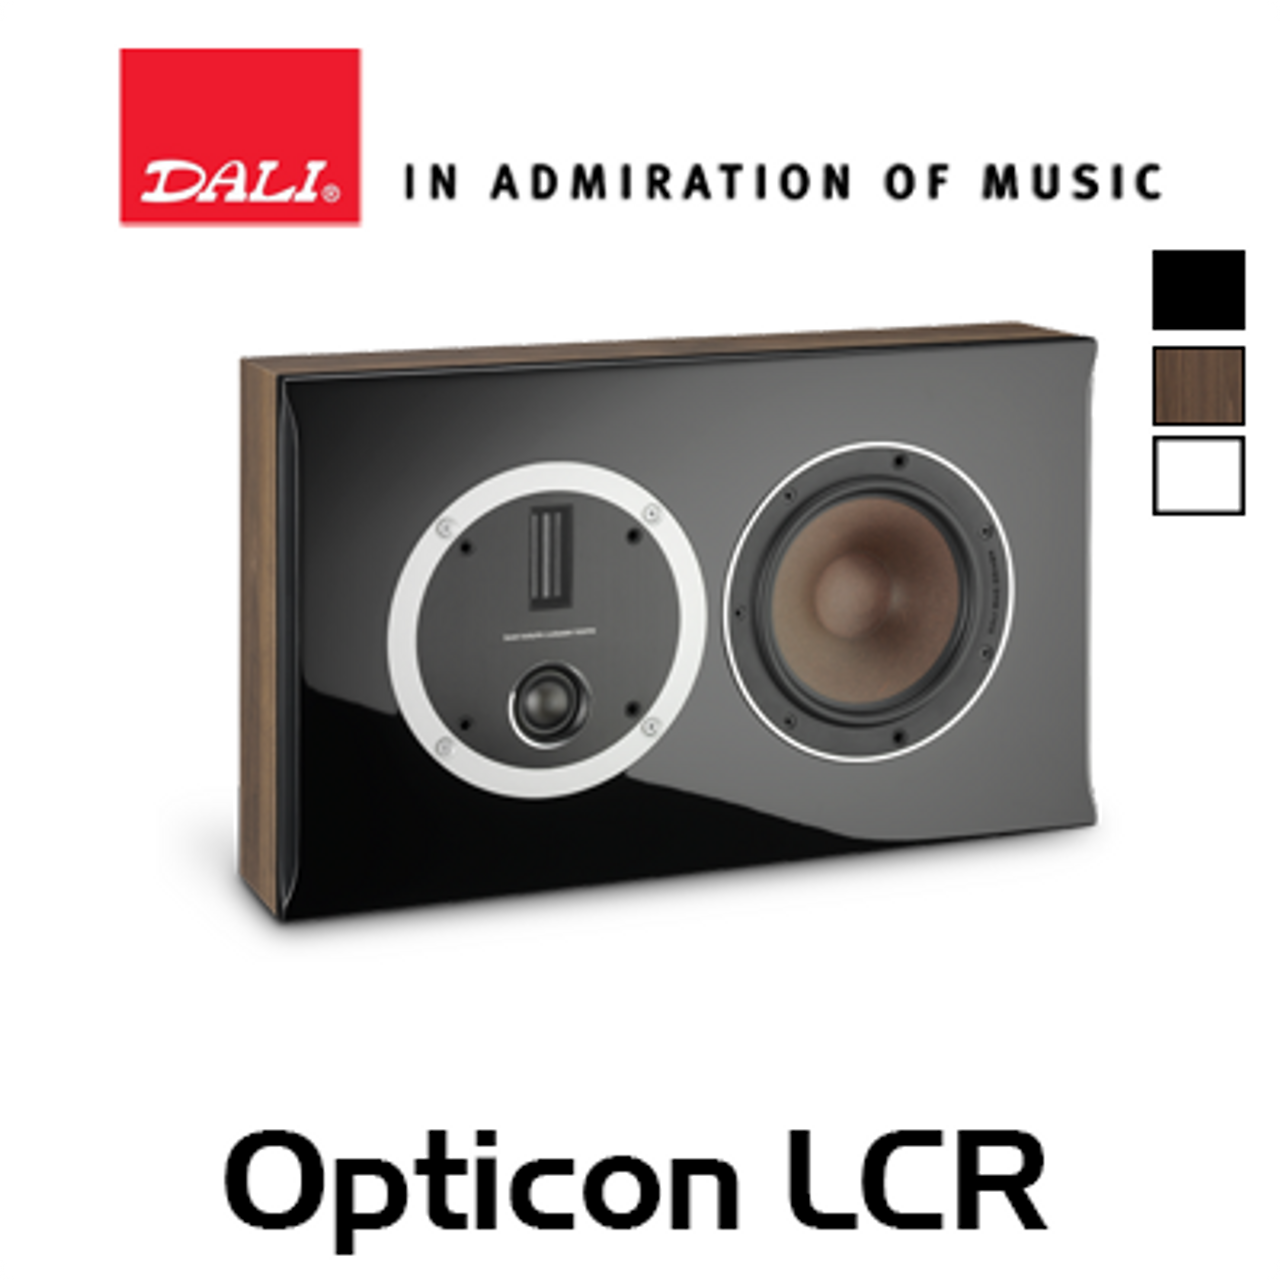 lcr opticon